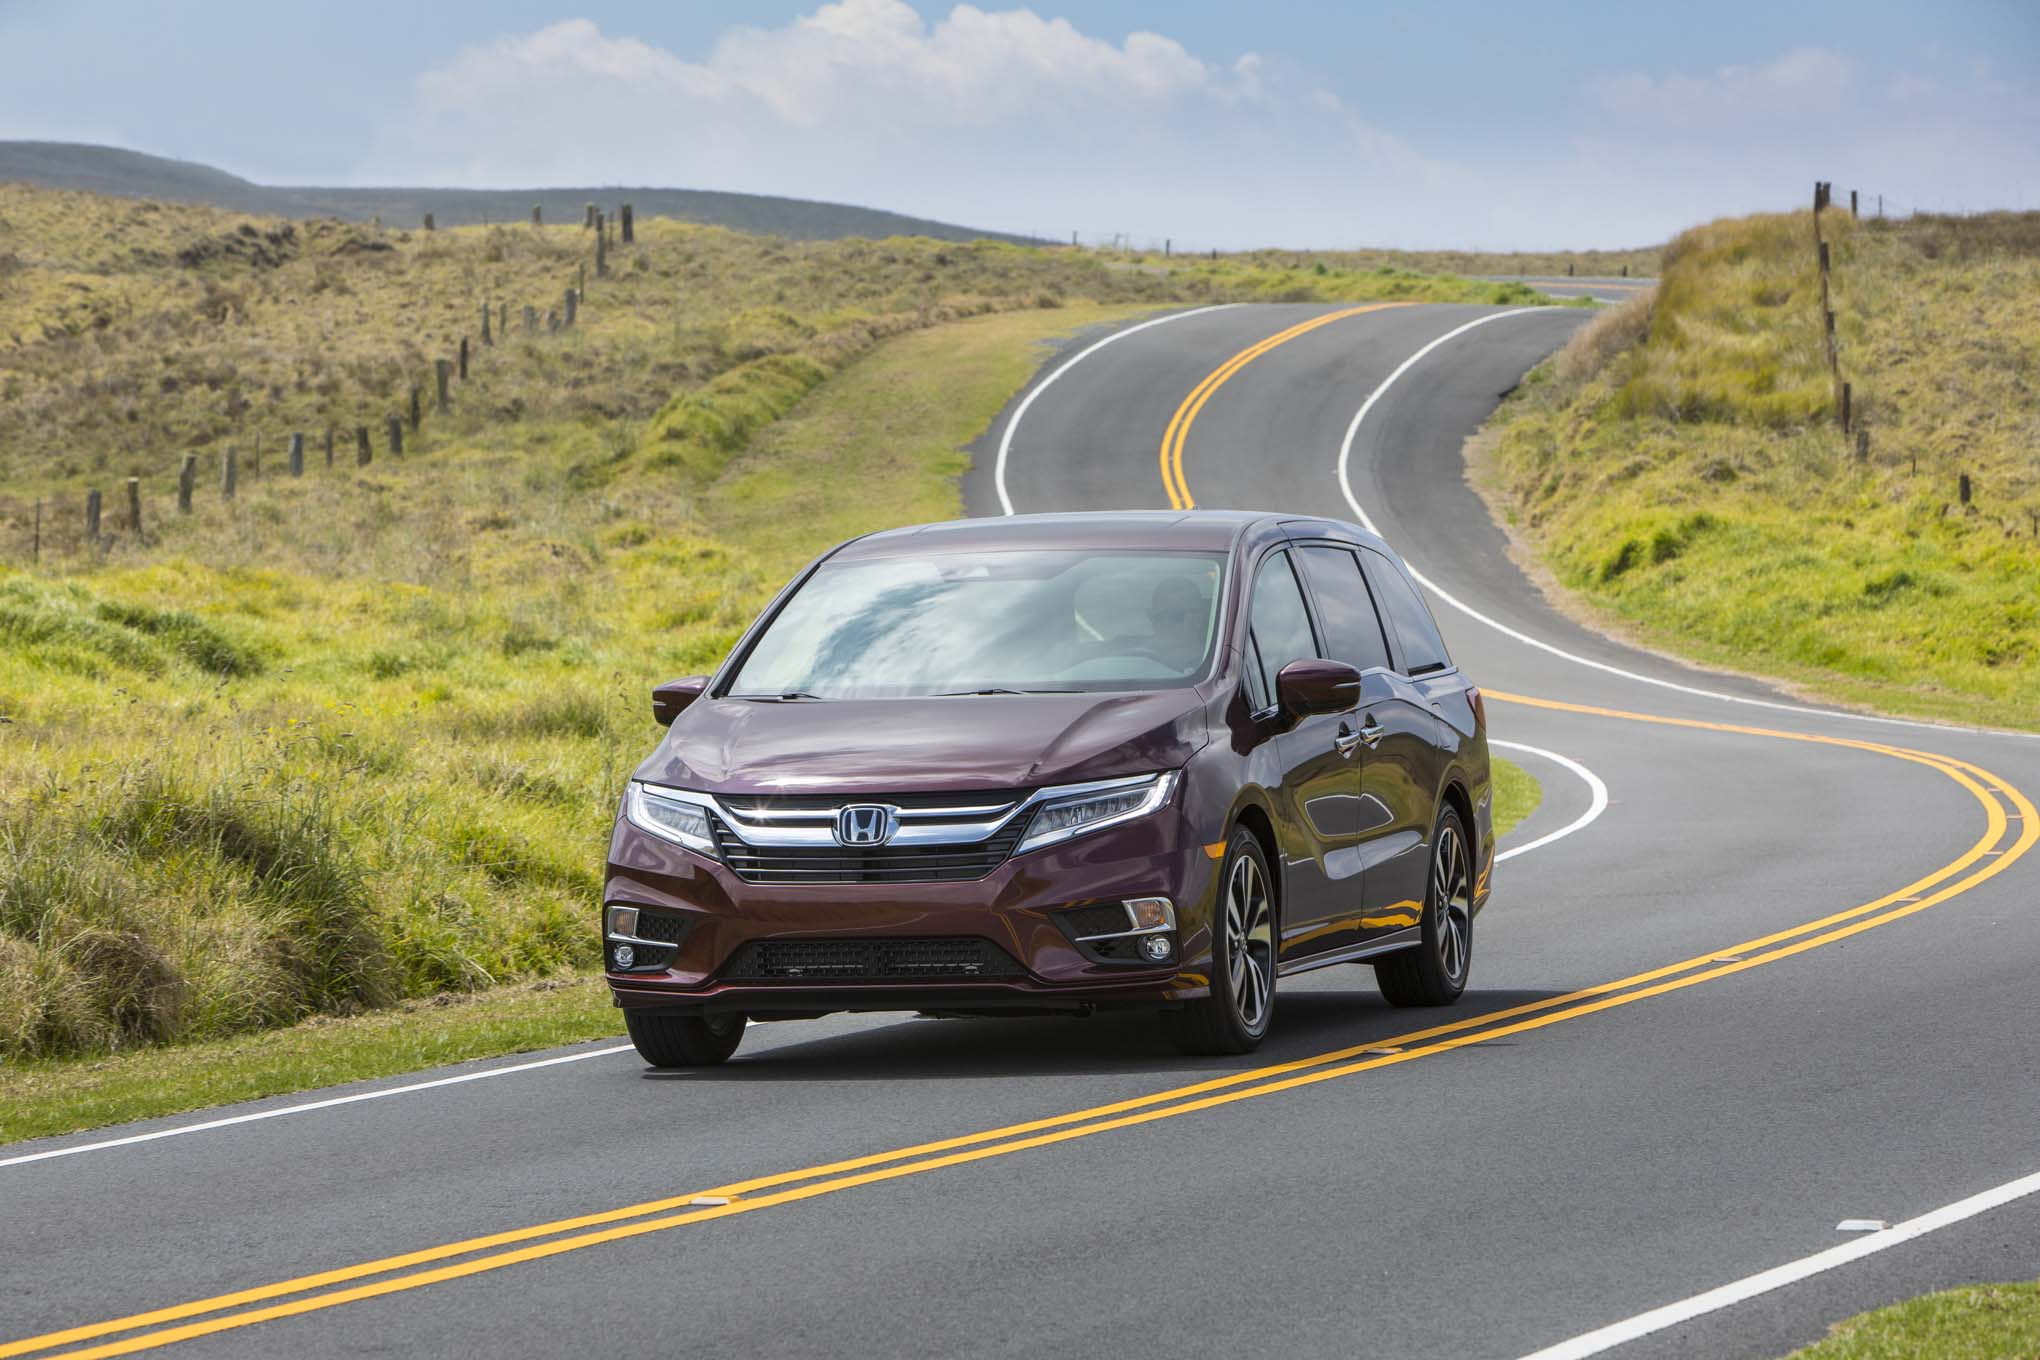 2018 Honda Odyssey Front Three Quarter In Motion